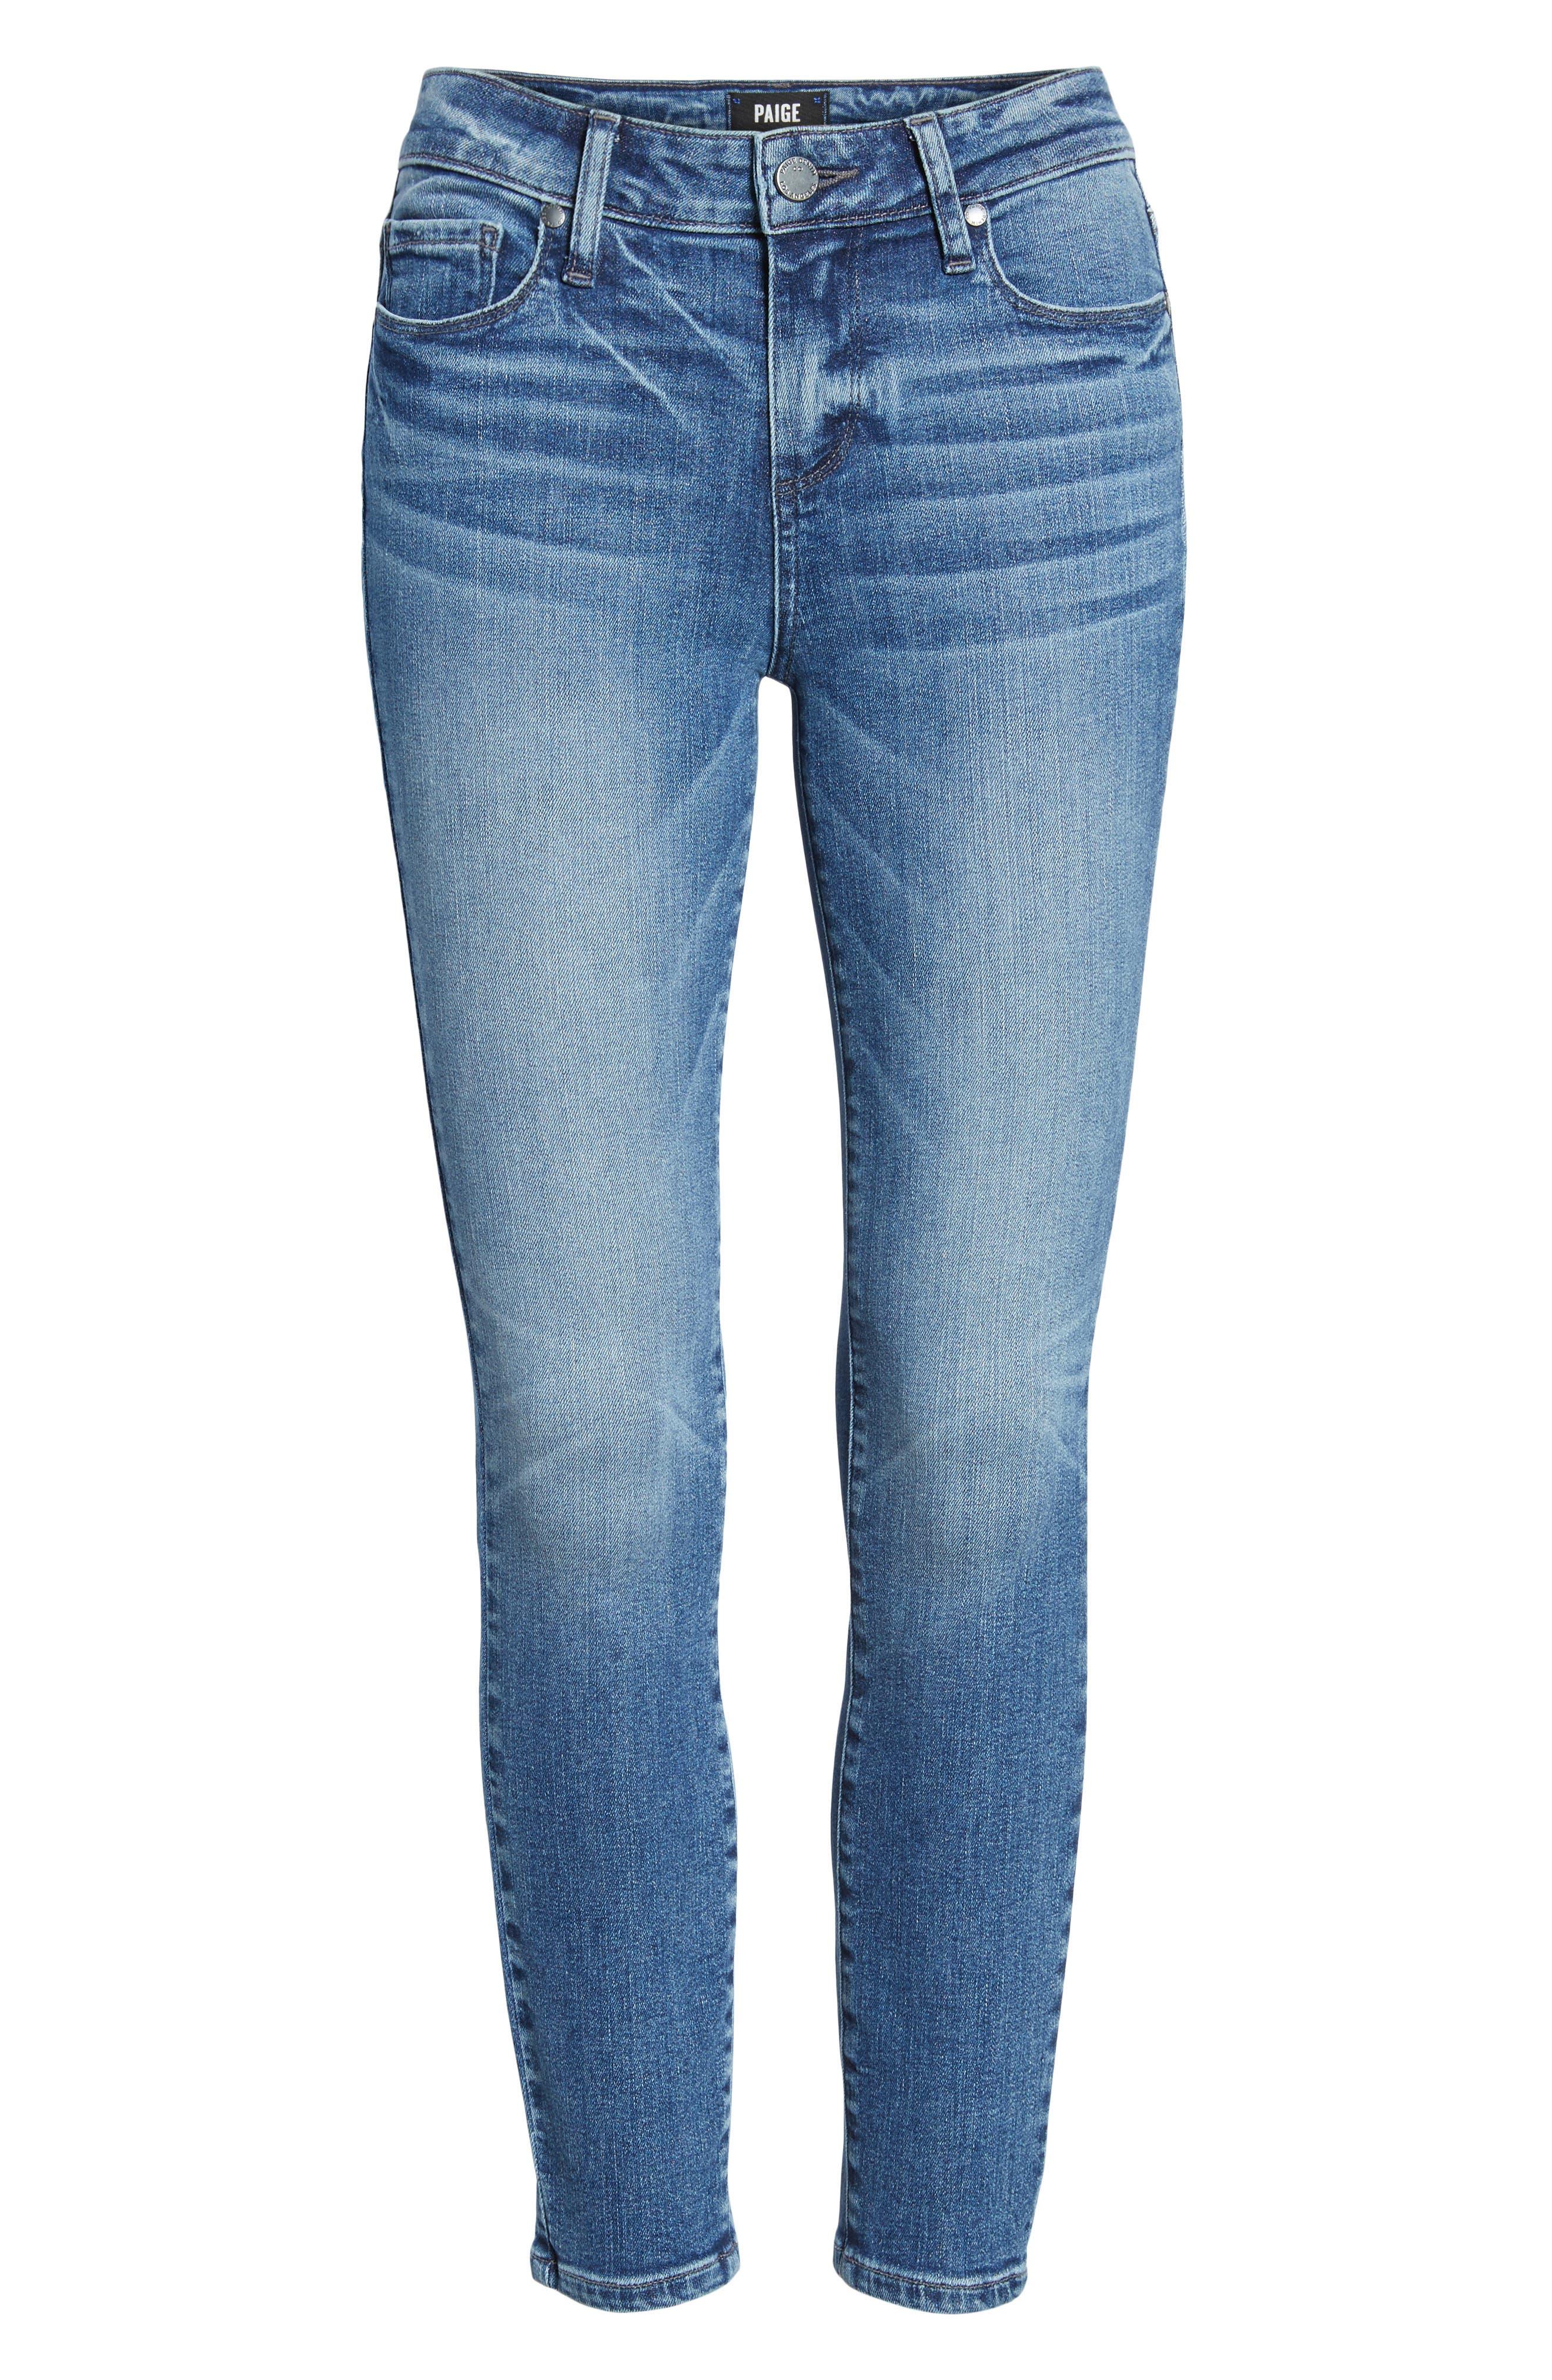 Transcend Vintage - Verdugo Crop Ultra Skinny Jeans,                             Alternate thumbnail 7, color,                             Bloomfield